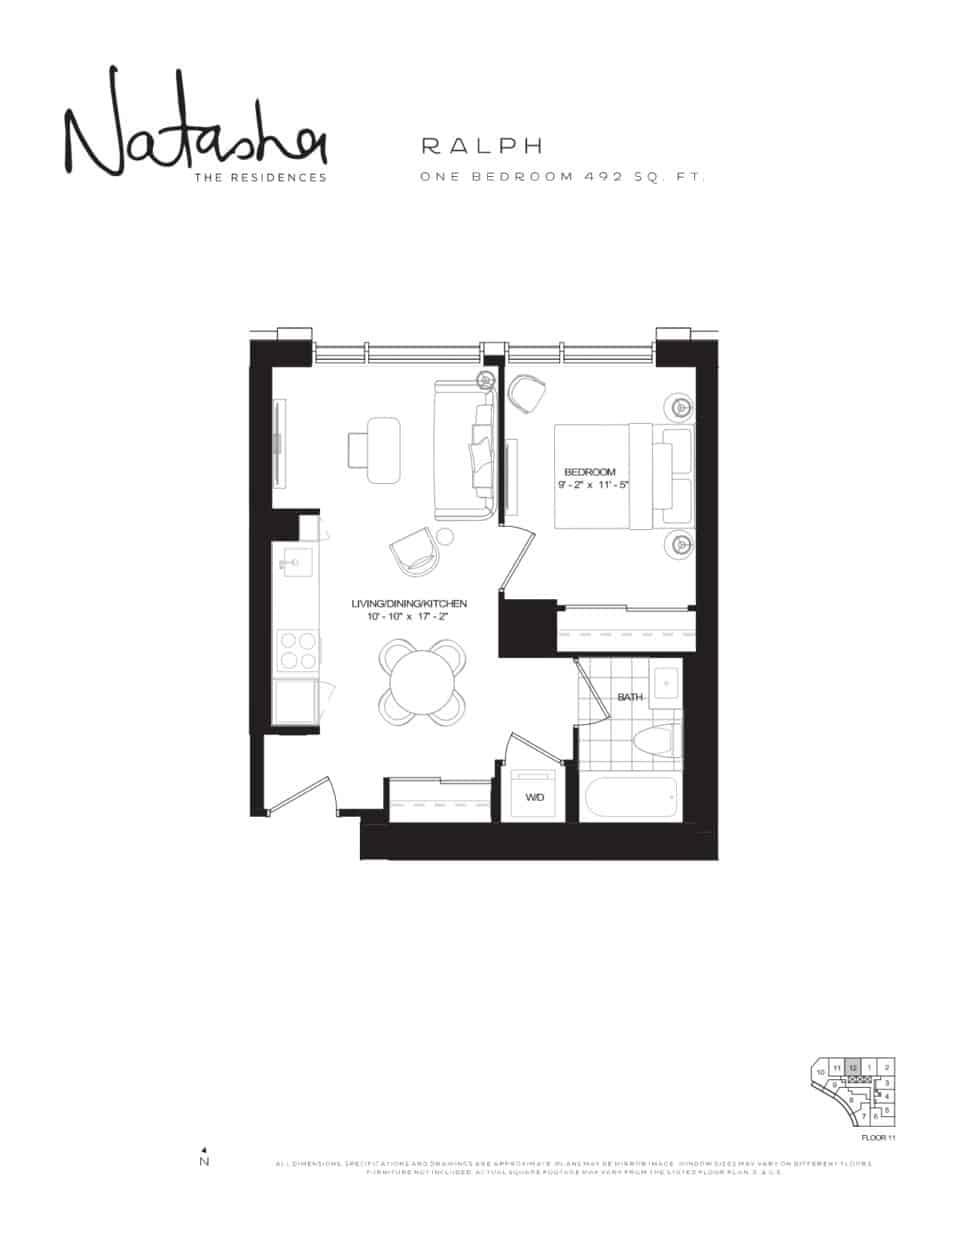 2021 09 02 11 03 04 natashatheresidences lanterradevelopments floorplans ralph